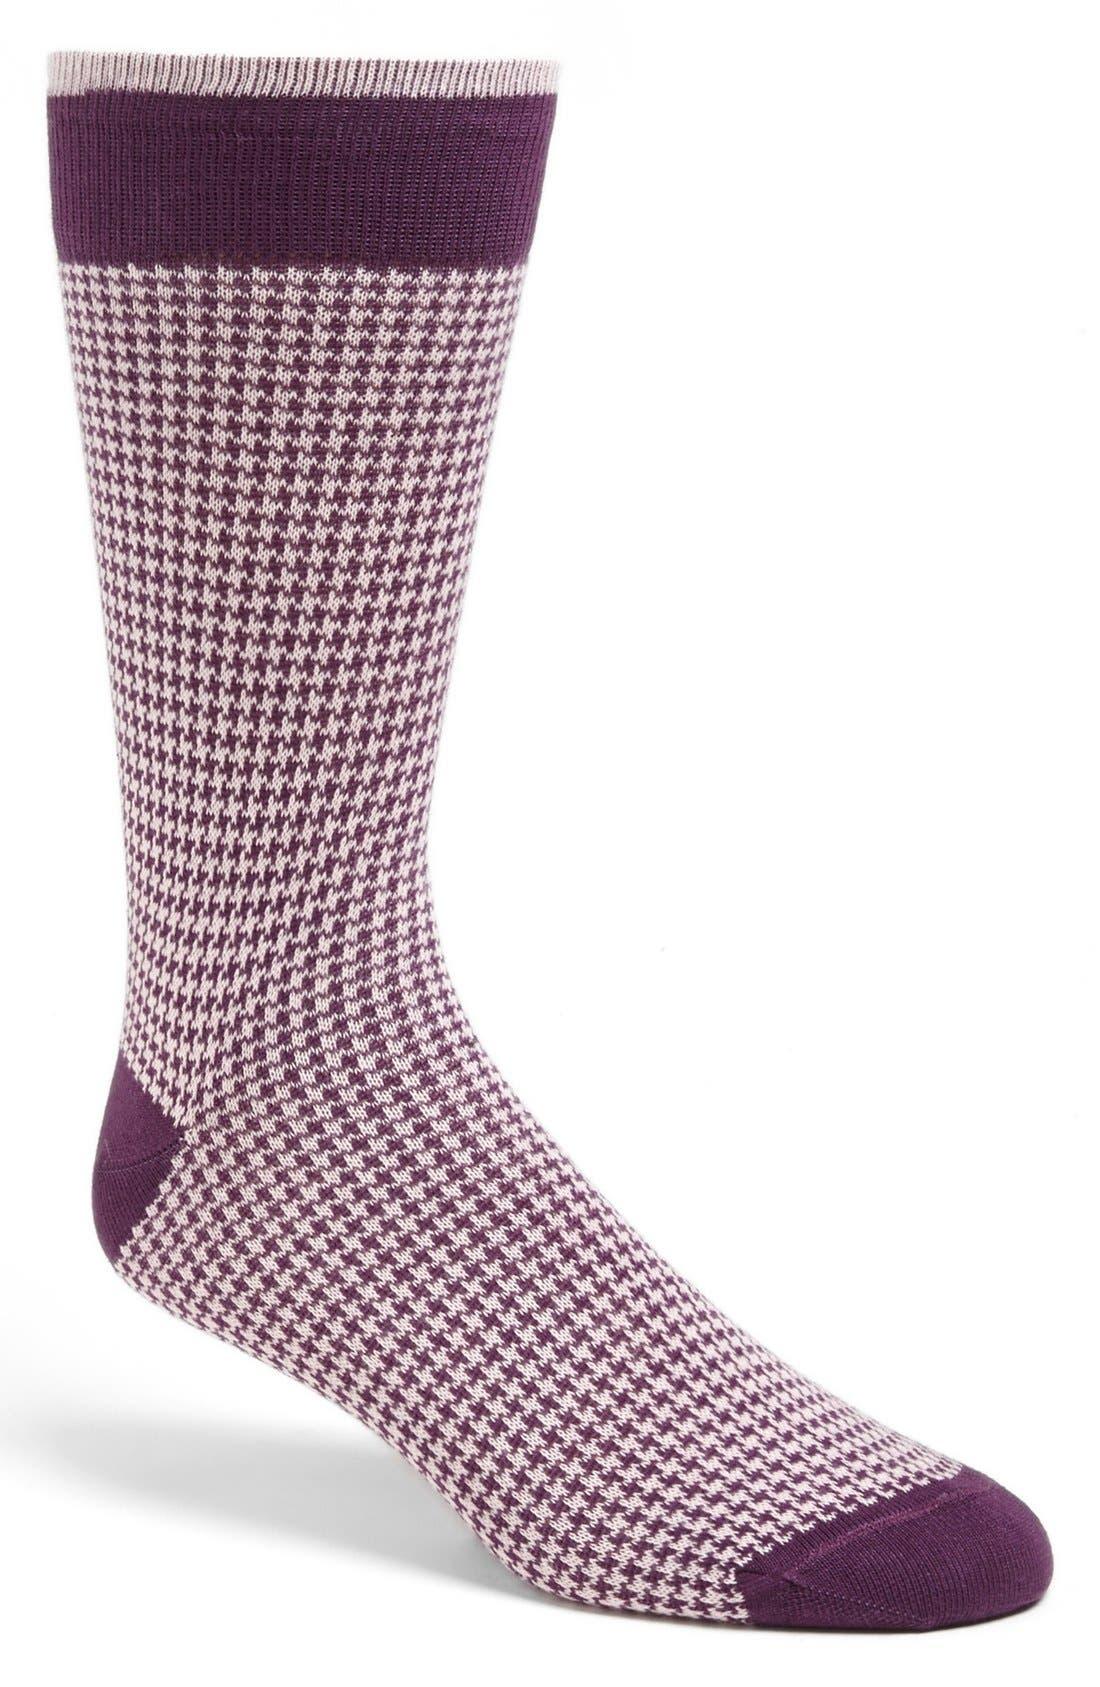 Alternate Image 1 Selected - Lorenzo Uomo Houndstooth Socks